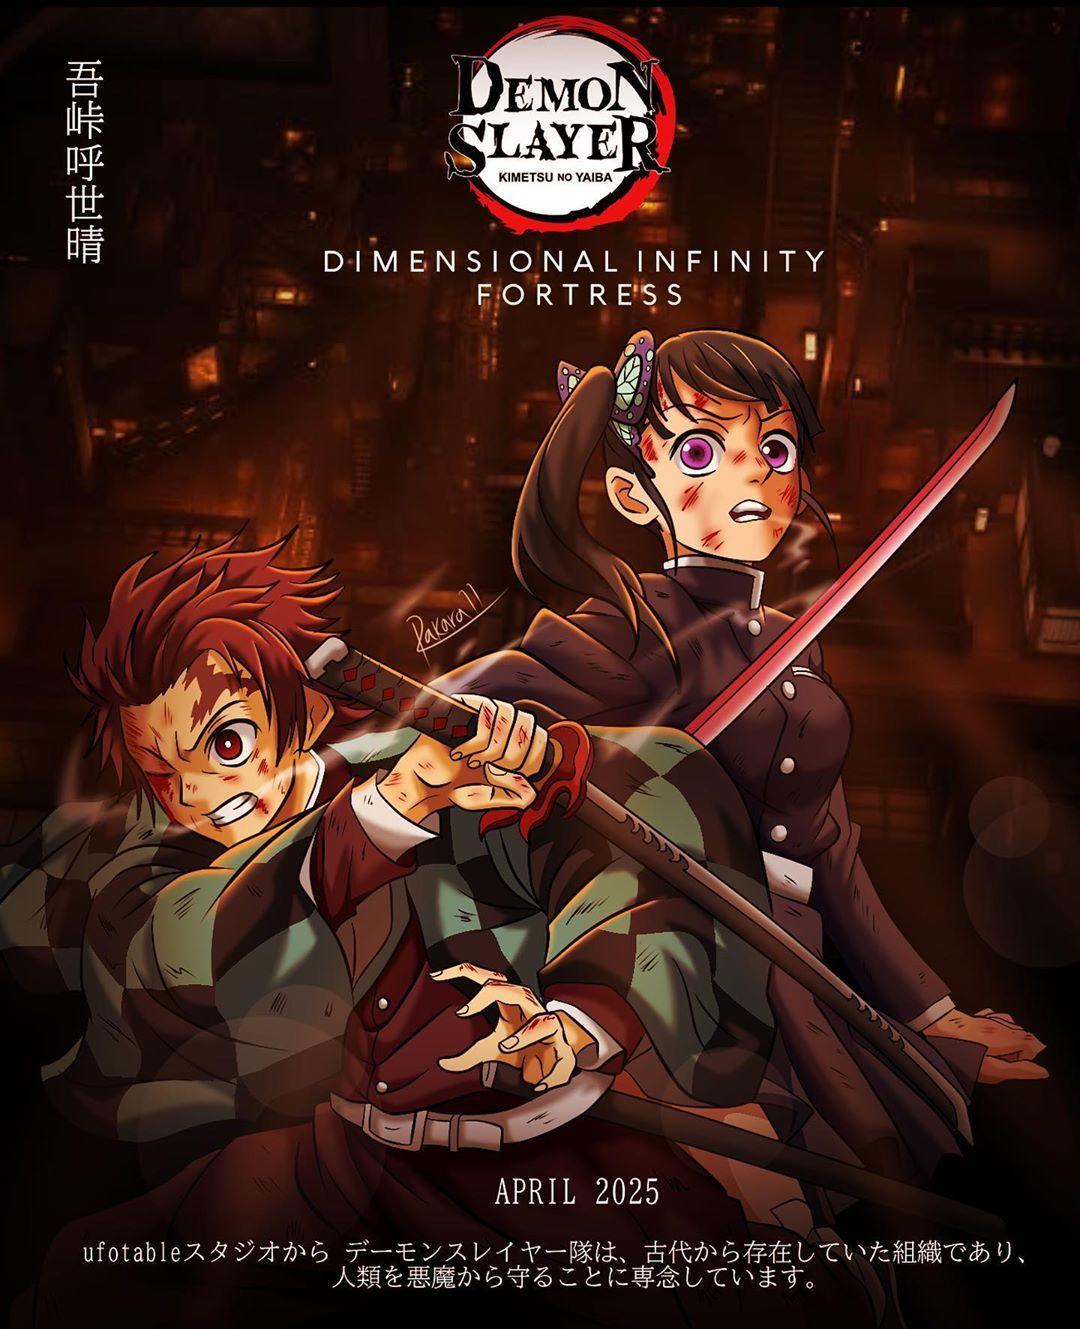 Demon Slayer Movie Dimensional Infinity Fortress 2025 Official Fake Poster Animasi Seni Anime Gambar Anime